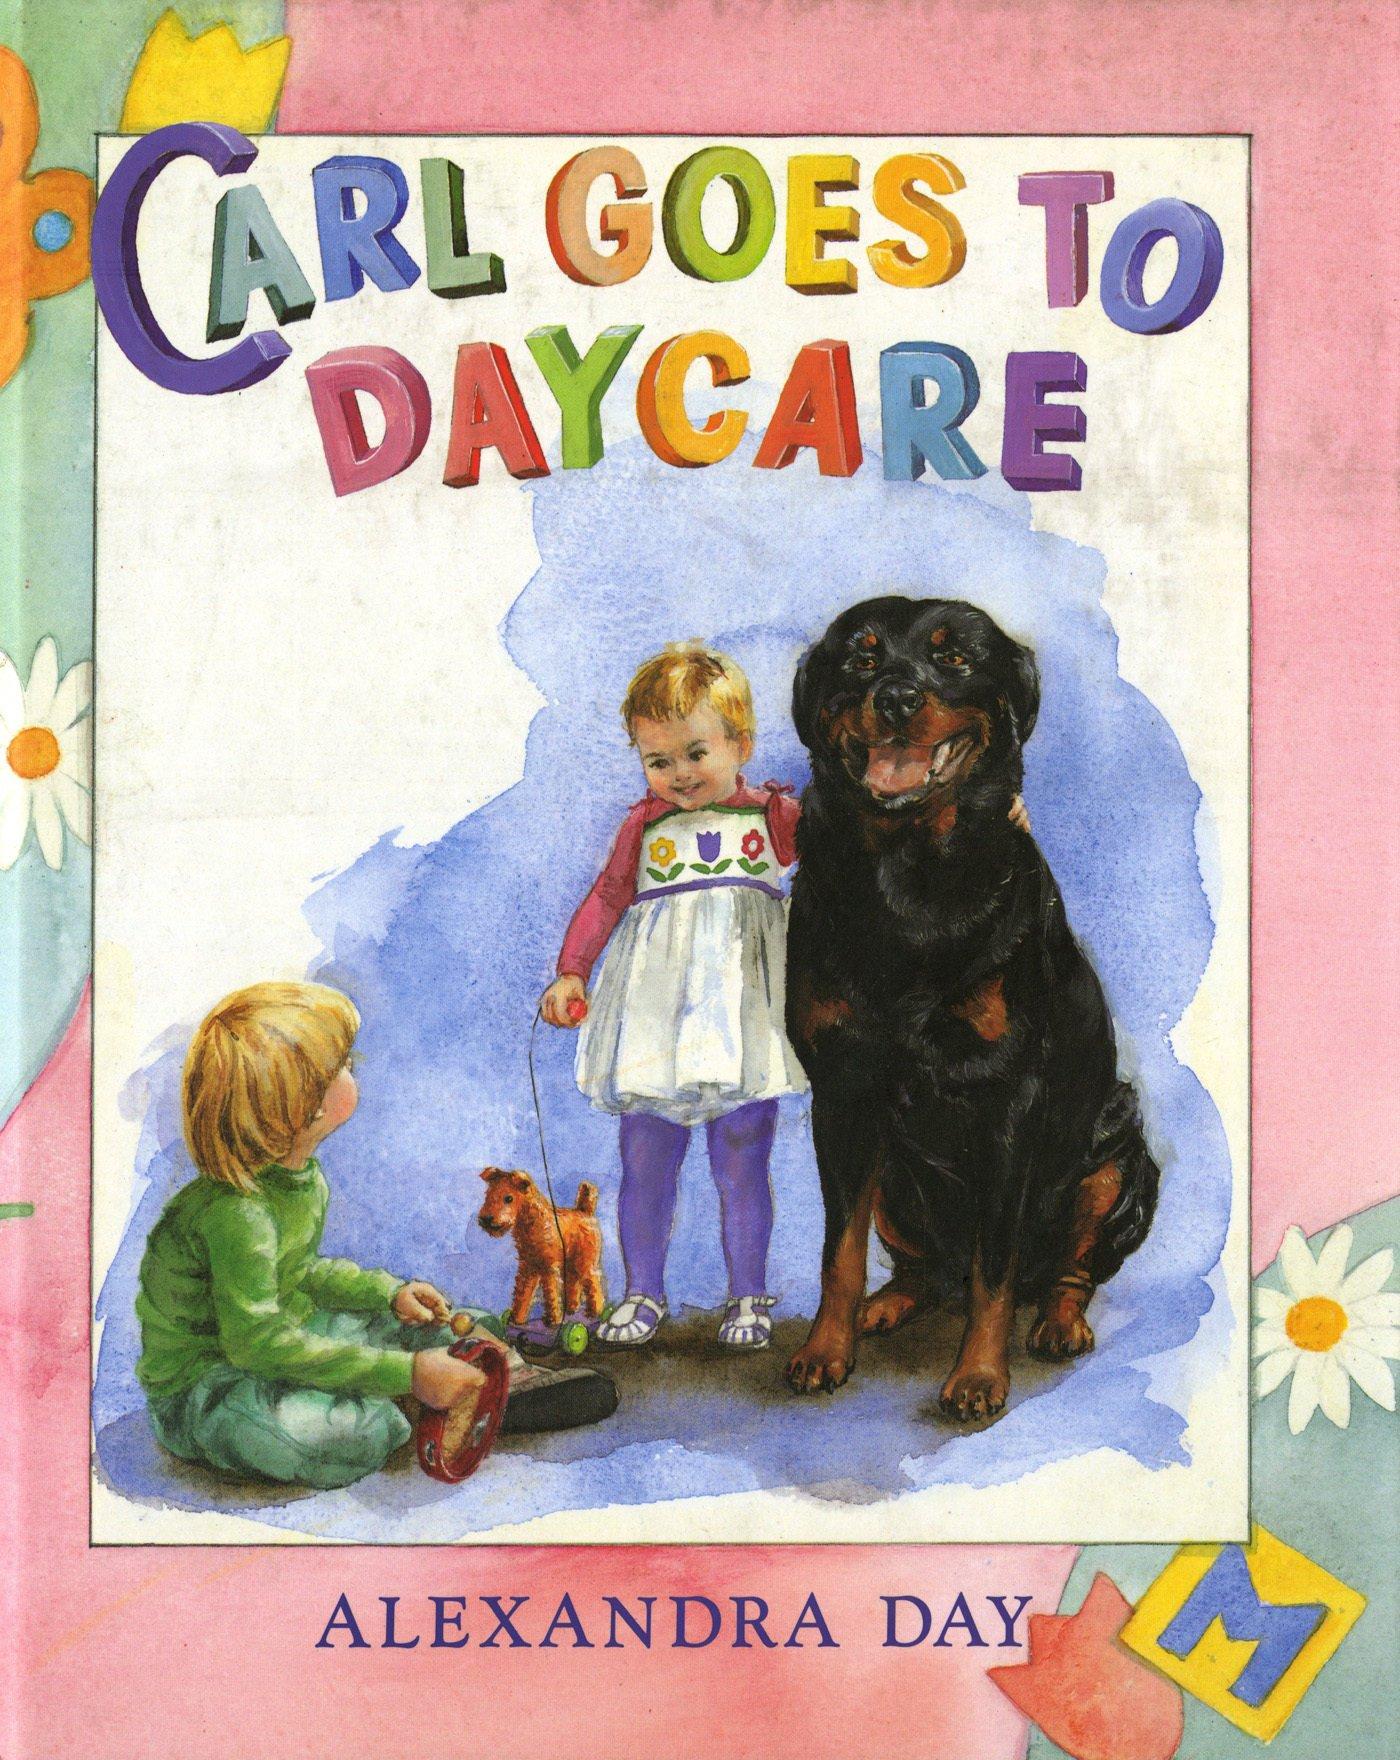 Carl Goes Daycare Alexandra Day